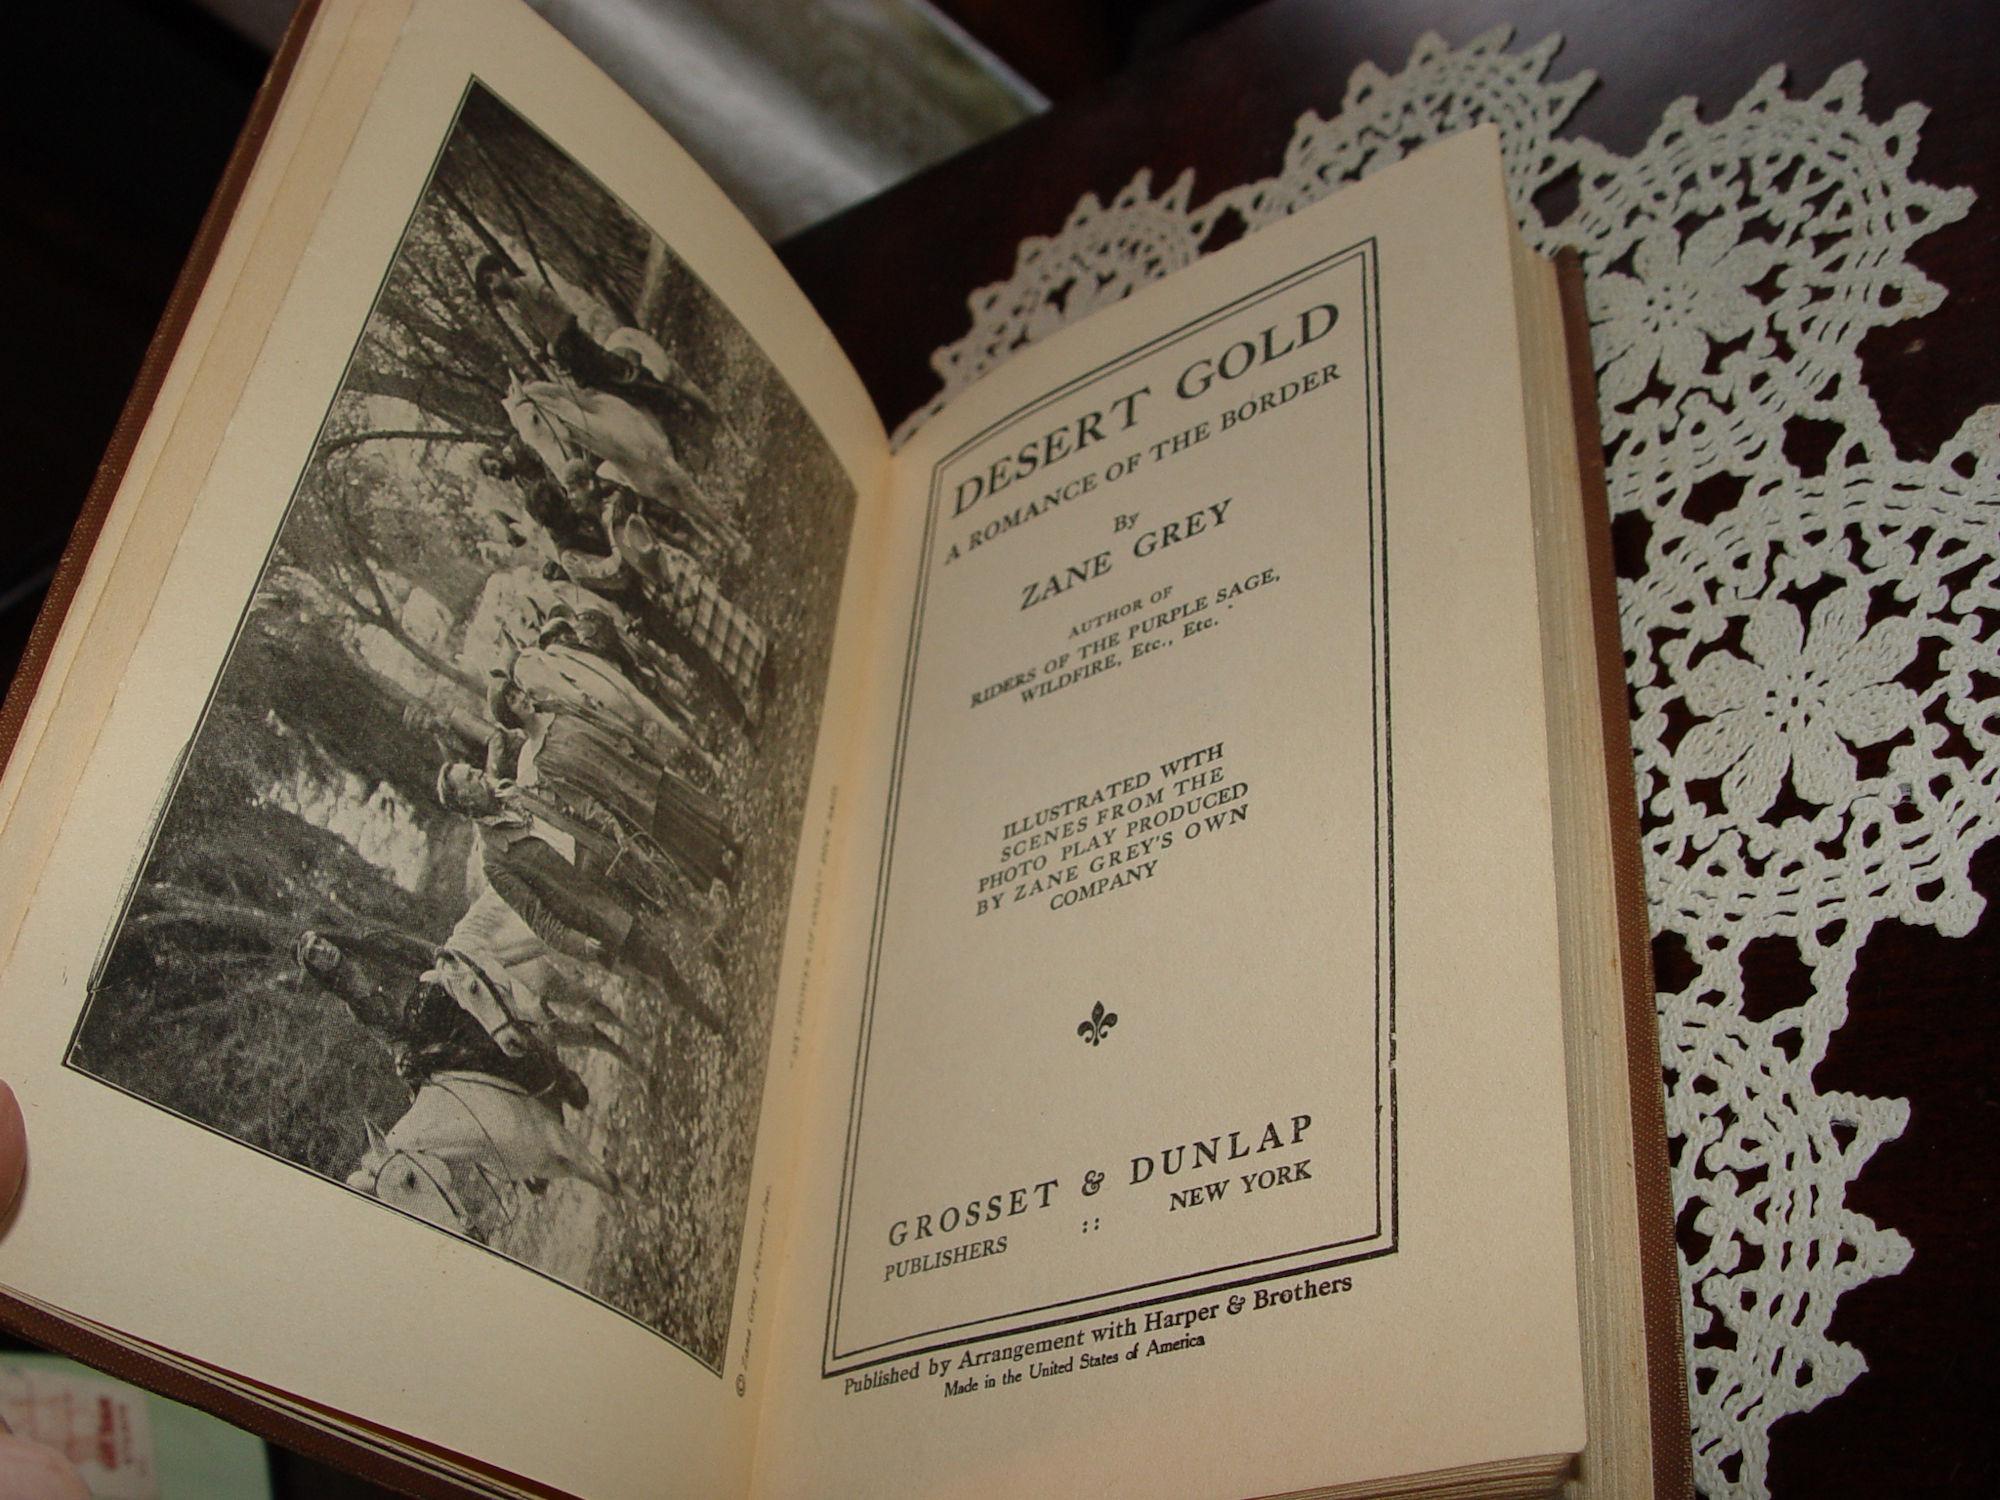 Zane Grey 1913, Desert                                         Gold, Western, Harper &                                         Brothers Grosset and Dunlap ~ A                                         Romance of the Border